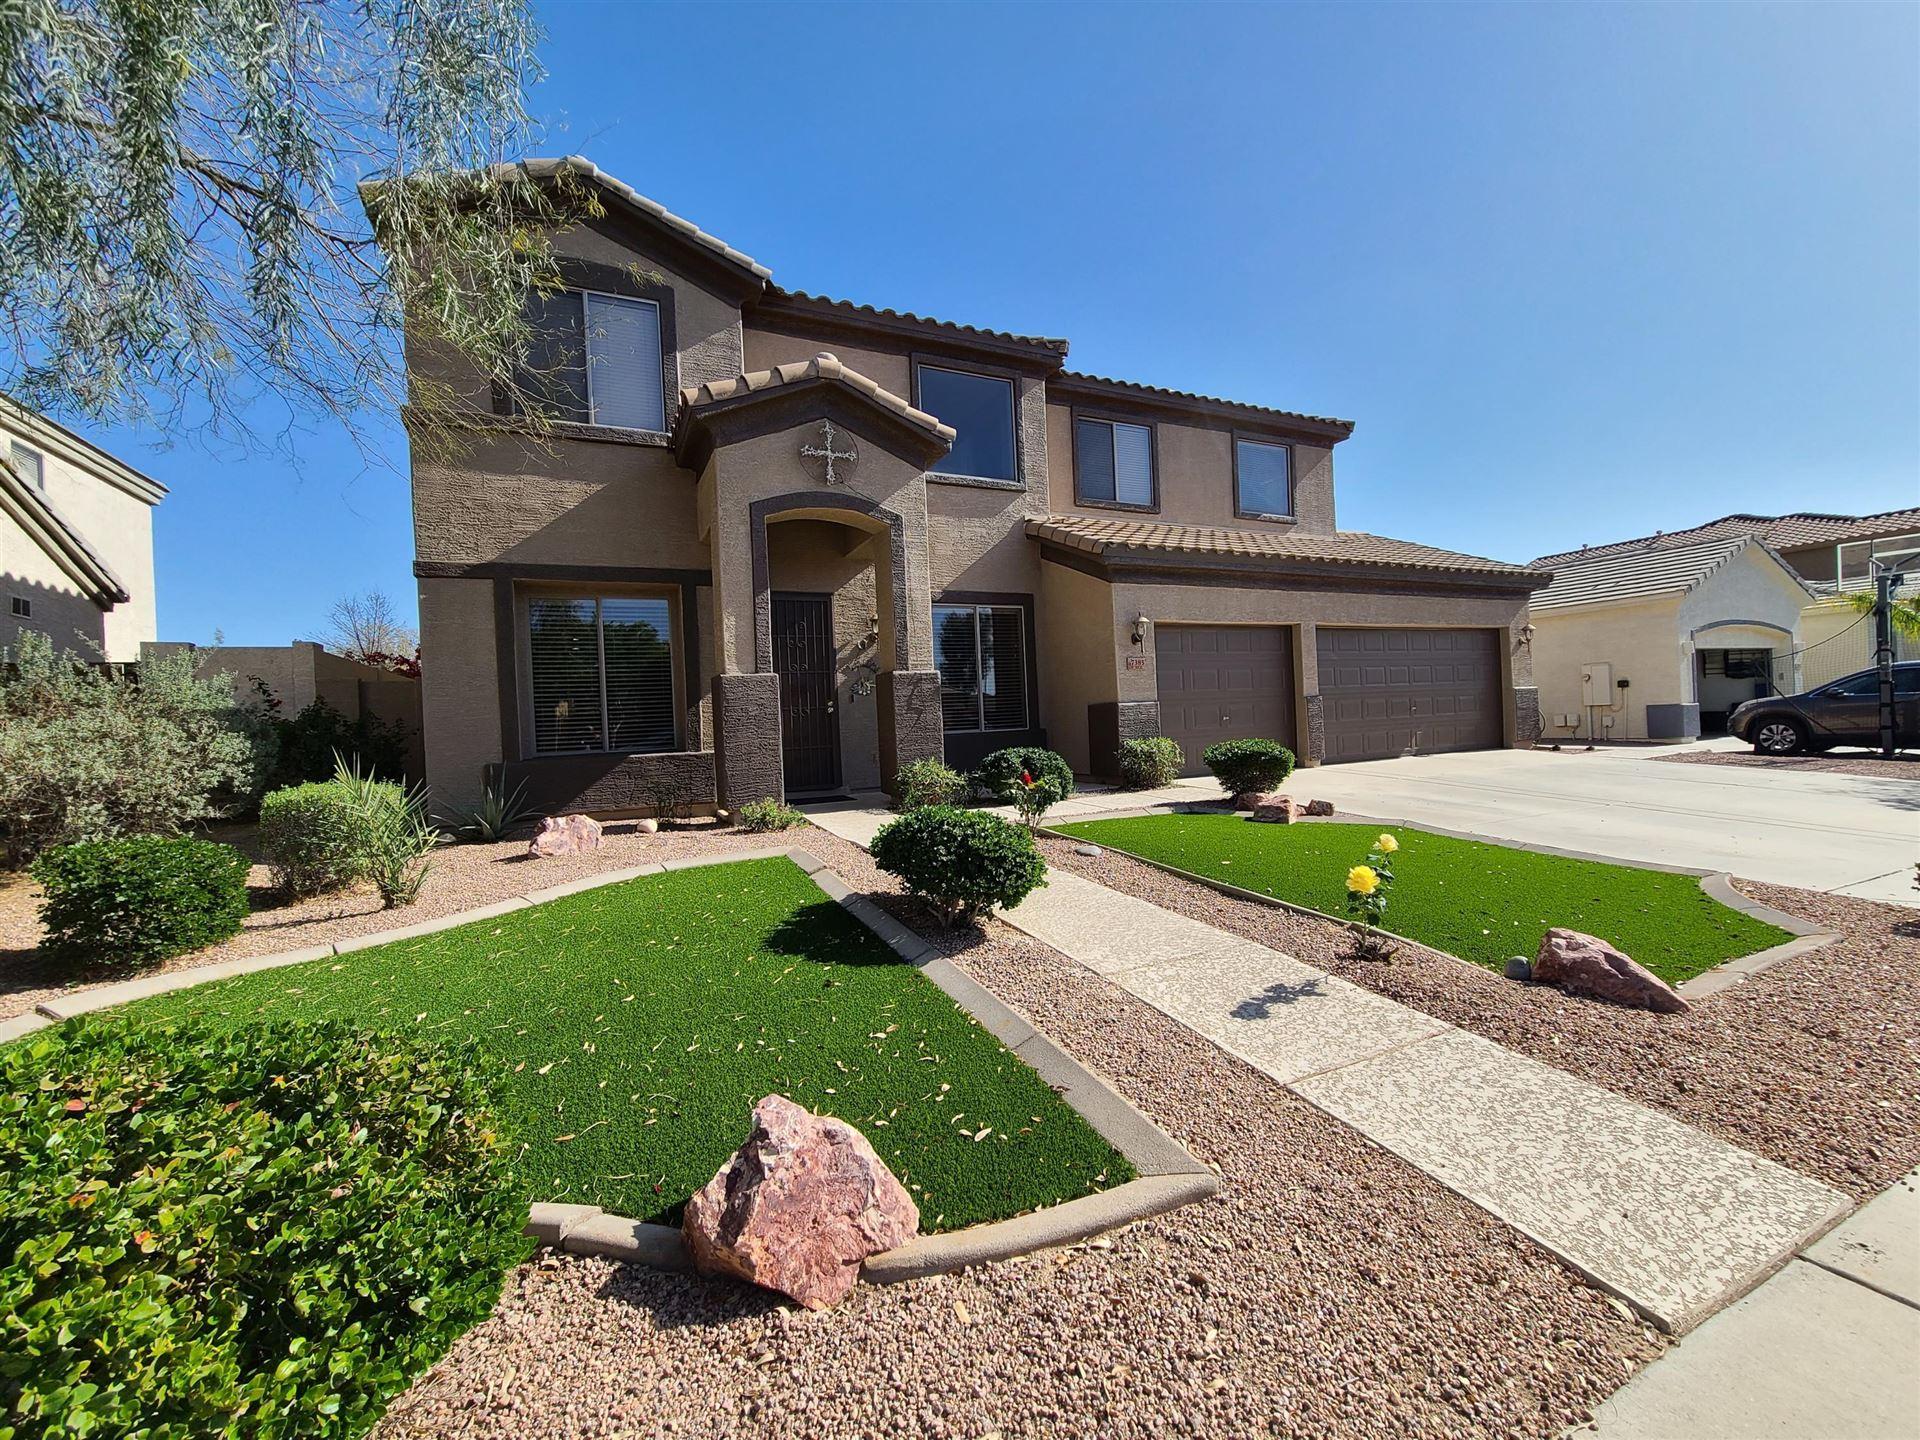 7385 W HONEYSUCKLE Drive, Peoria, AZ 85383 - #: 6215135